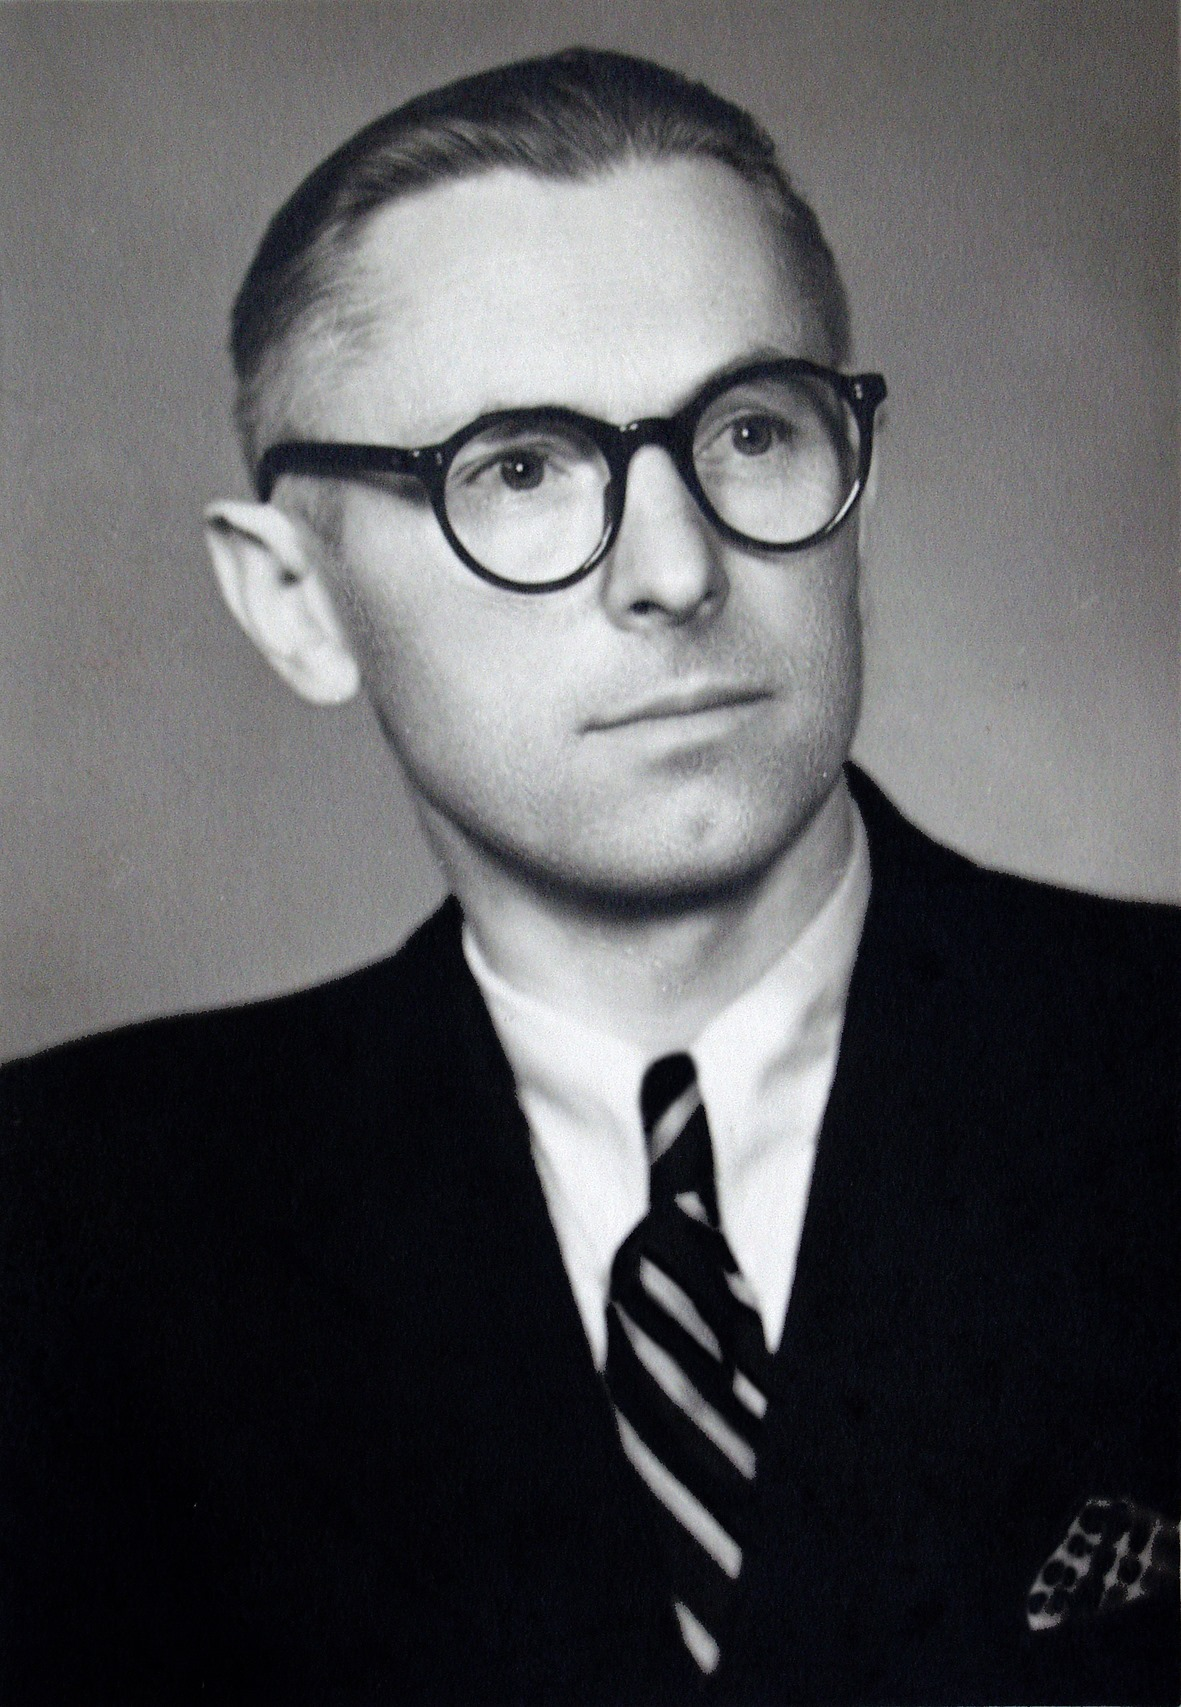 Zentai János 1939